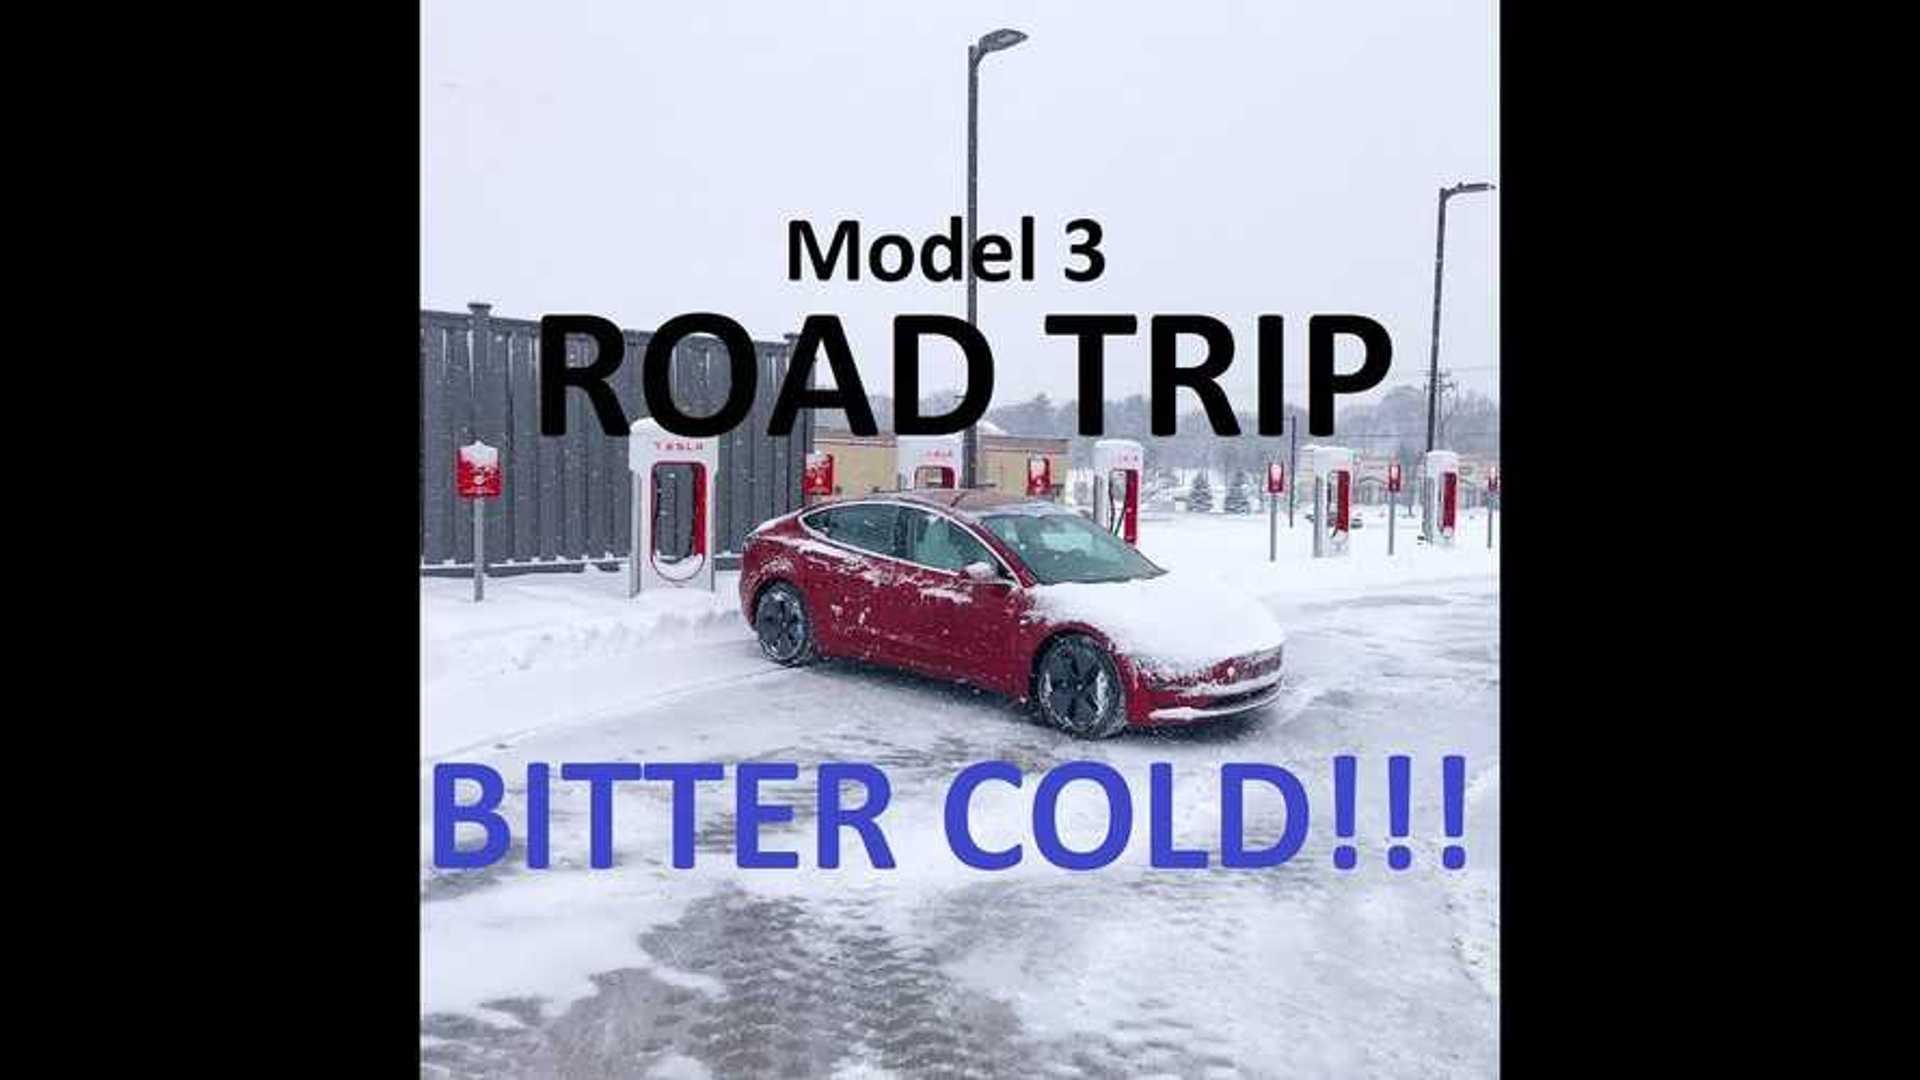 Tesla Model 3 Road Trip In Bitter Cold & 2 Feet Of Snow: Video